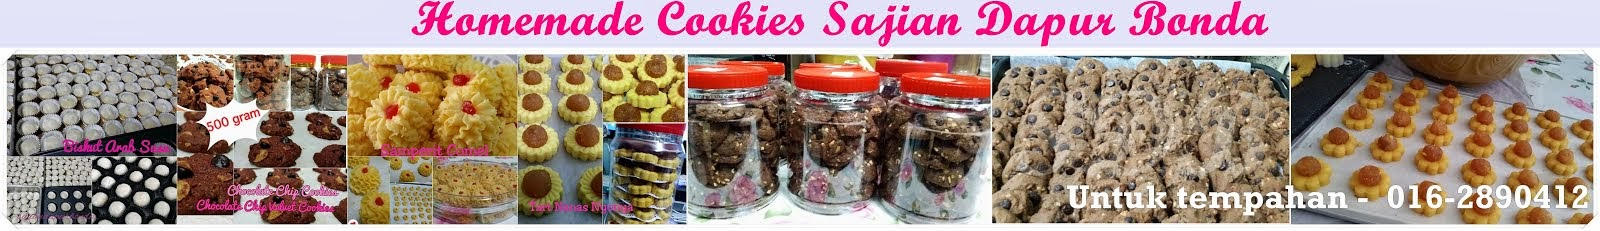 Homemade Cookies Sajian Dapur Bonda